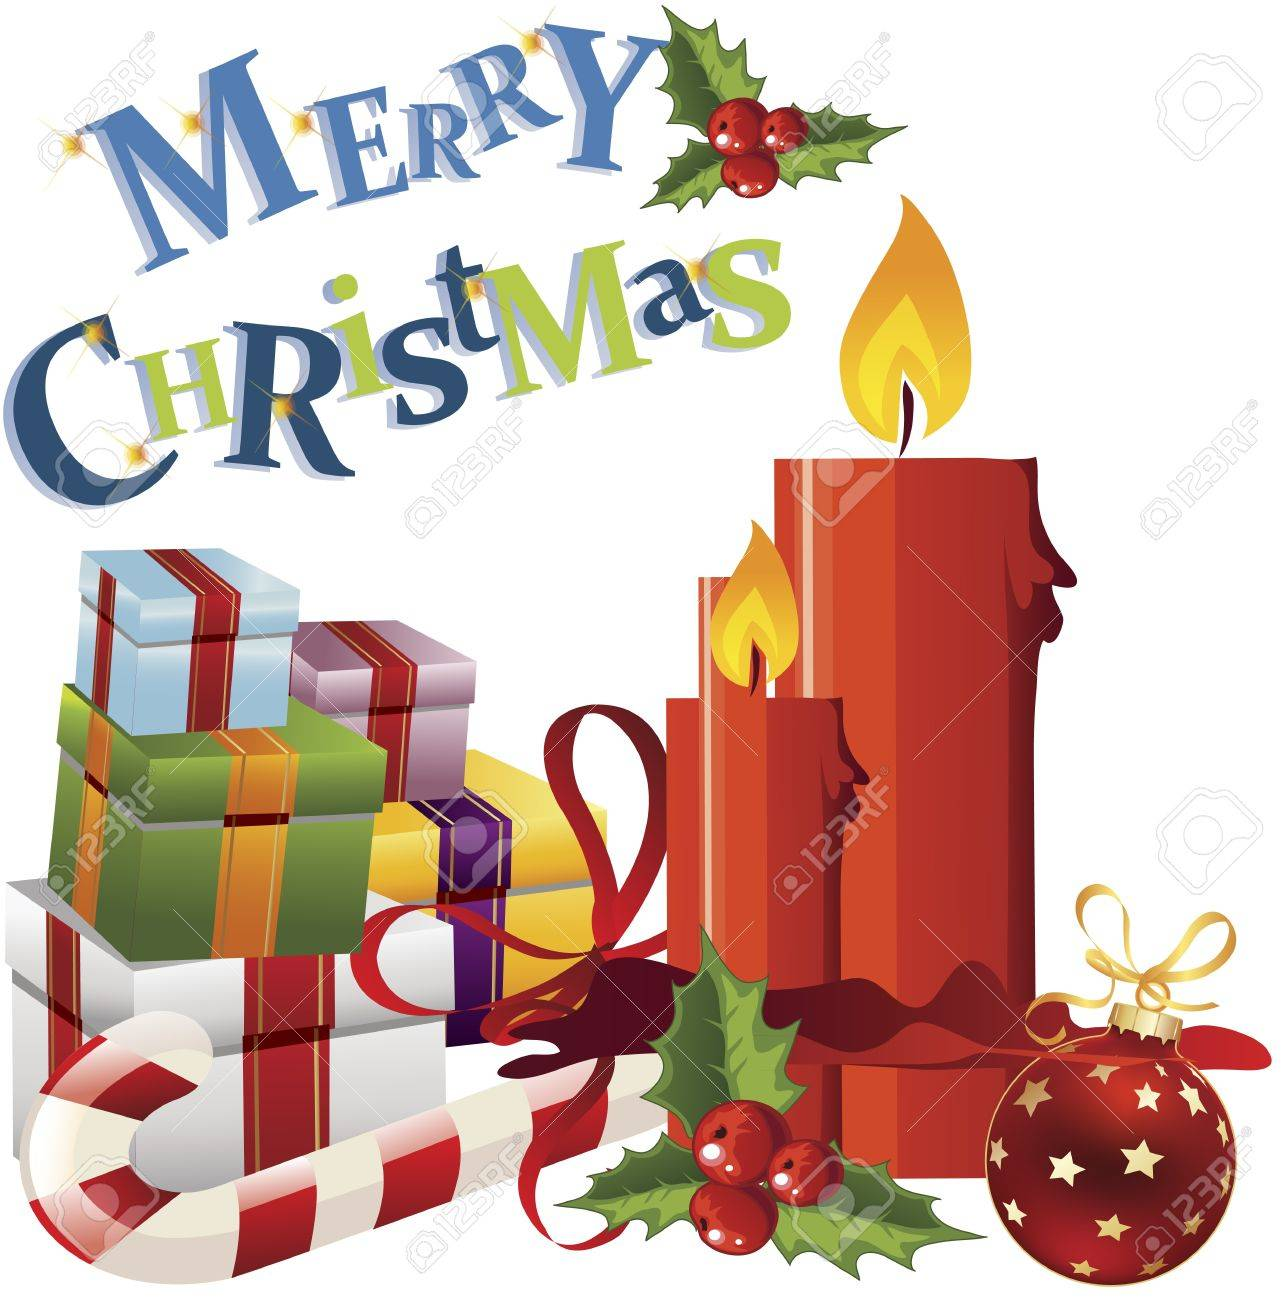 Christmas Card Clip Art.Christmas Greeting Card Clip Art